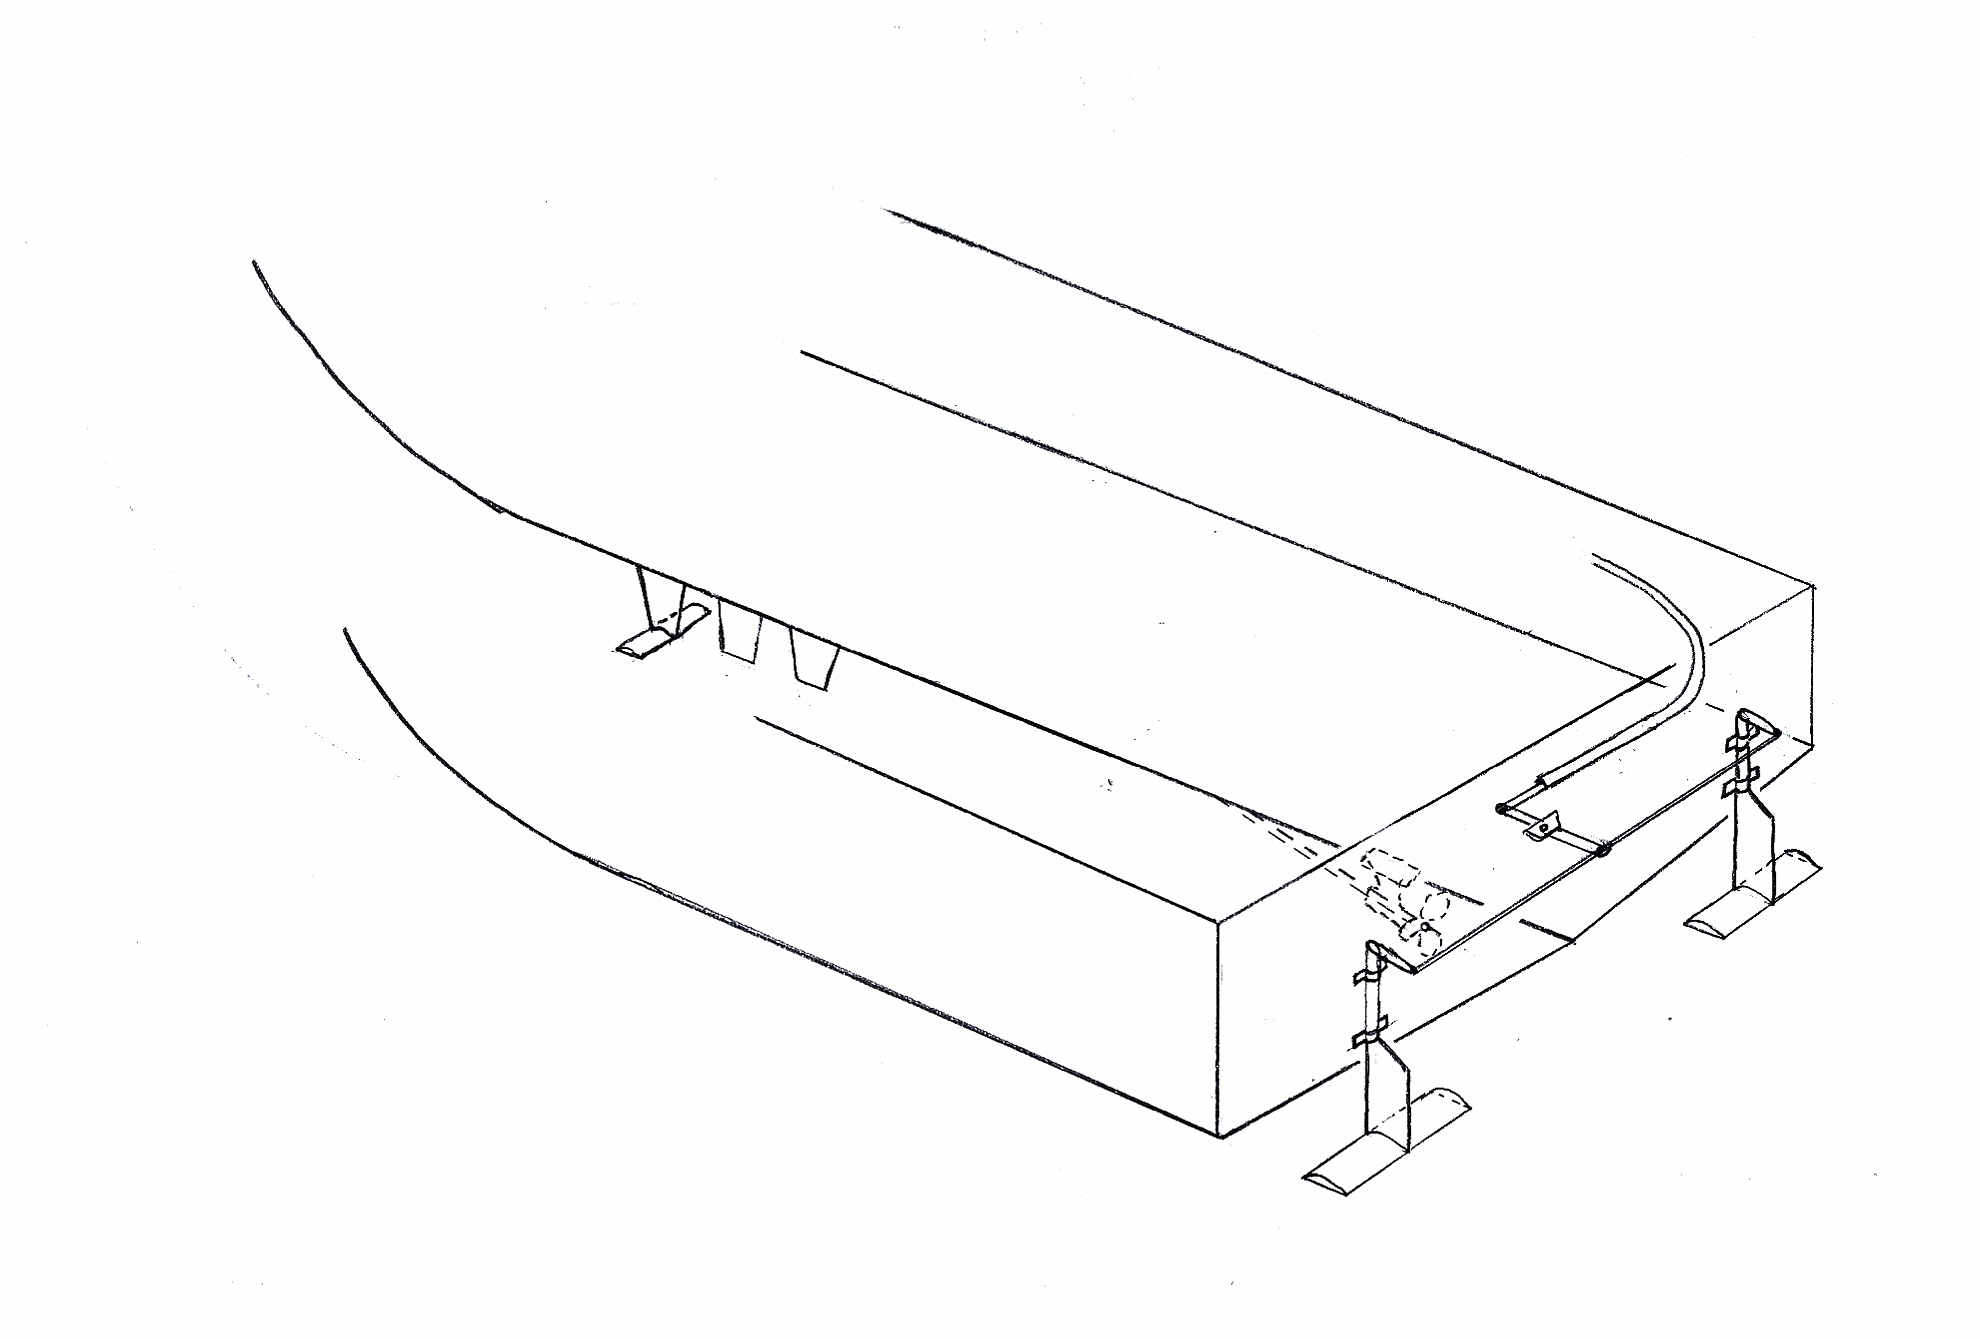 Hydrofoil Drawing At Getdrawings